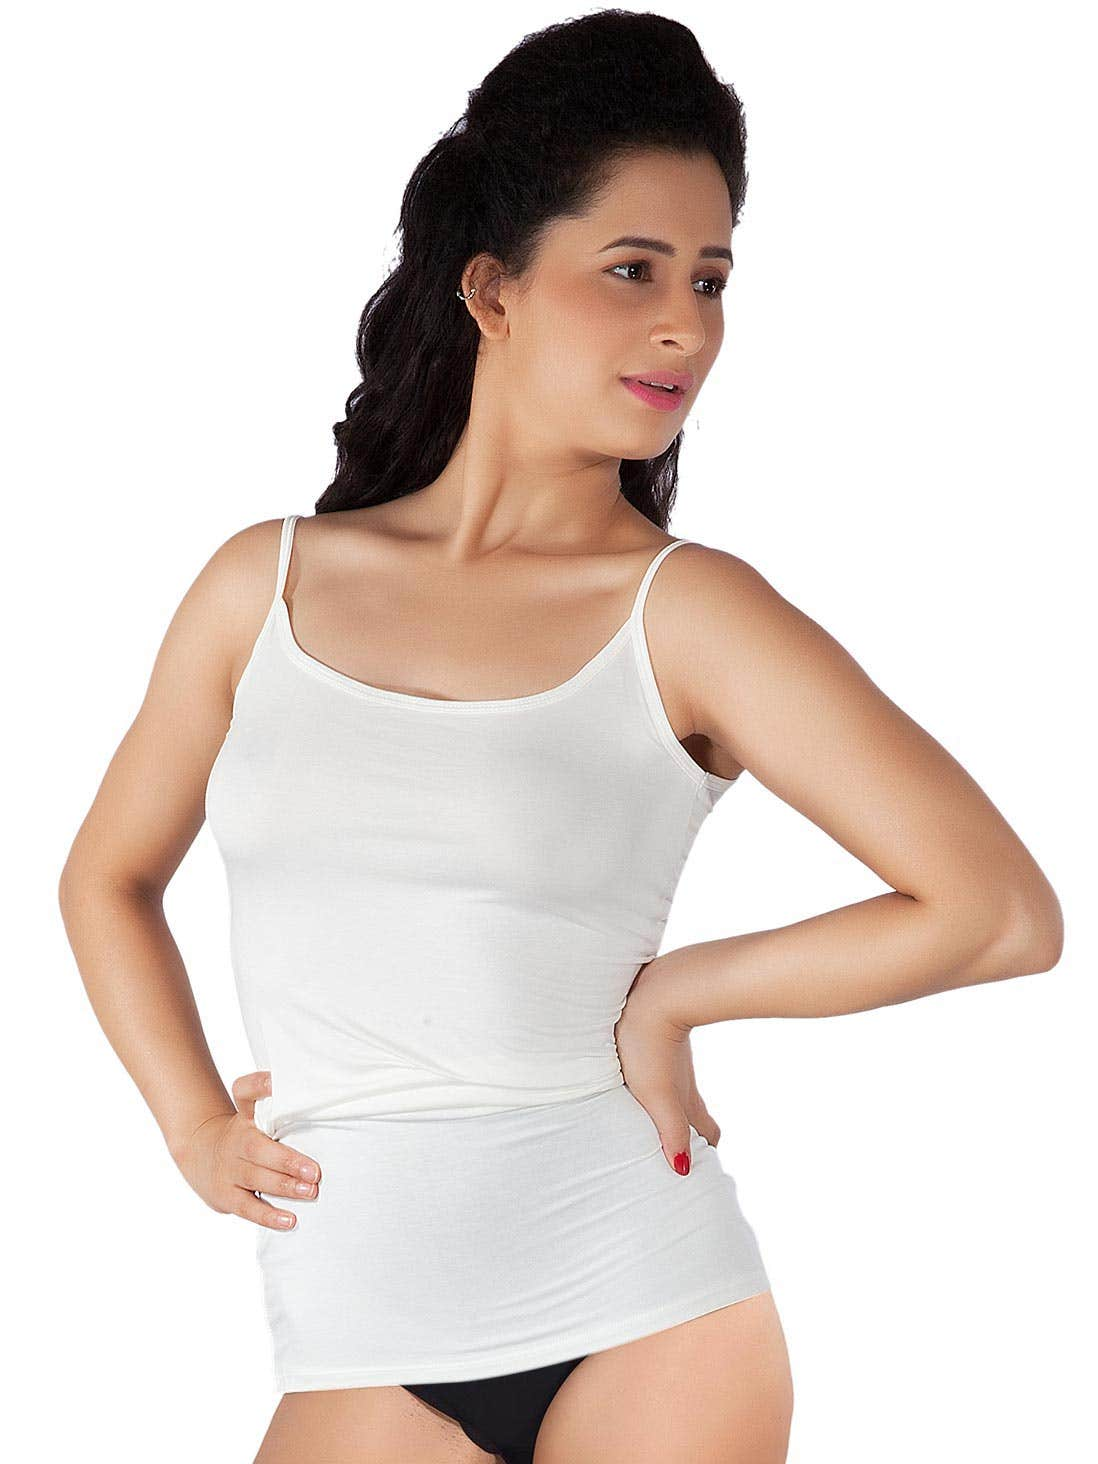 a253b6eaa1f32 Shyle White Ultra Soft Camisole